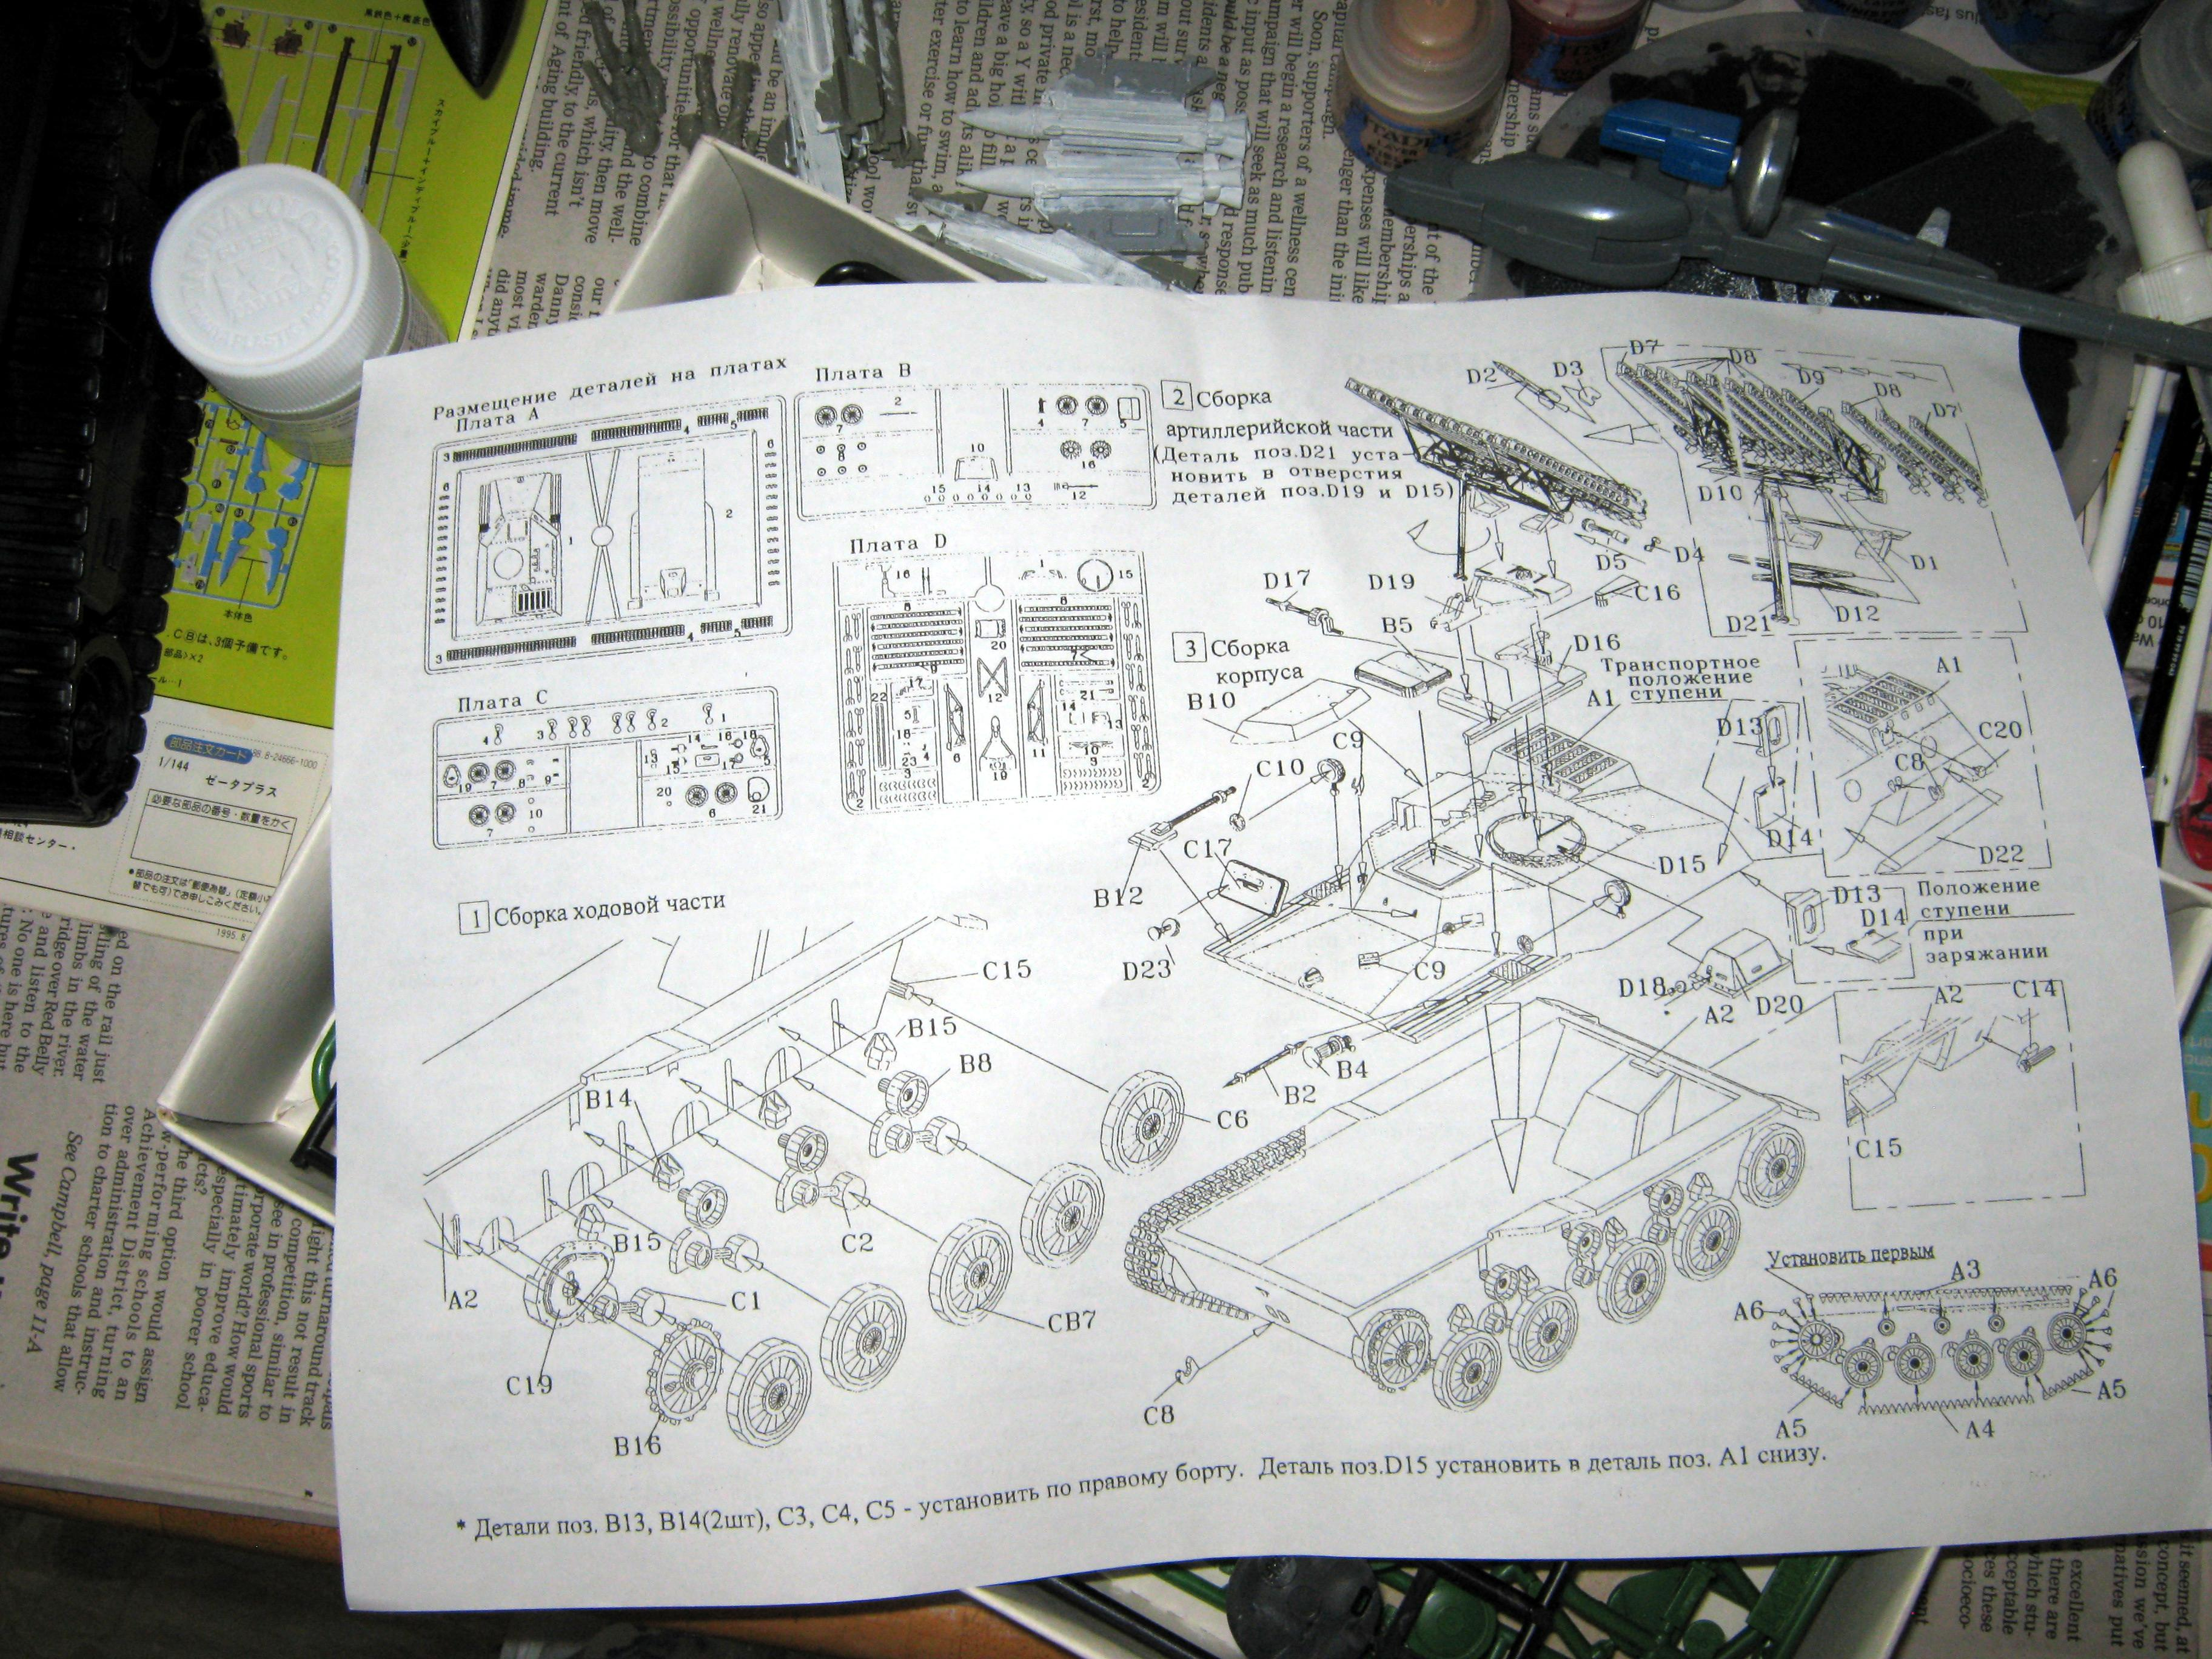 Artillery, Conversion, Katyusha, Rocket Launcher, Russians, Self-propelled, Soviet, T40, Tank